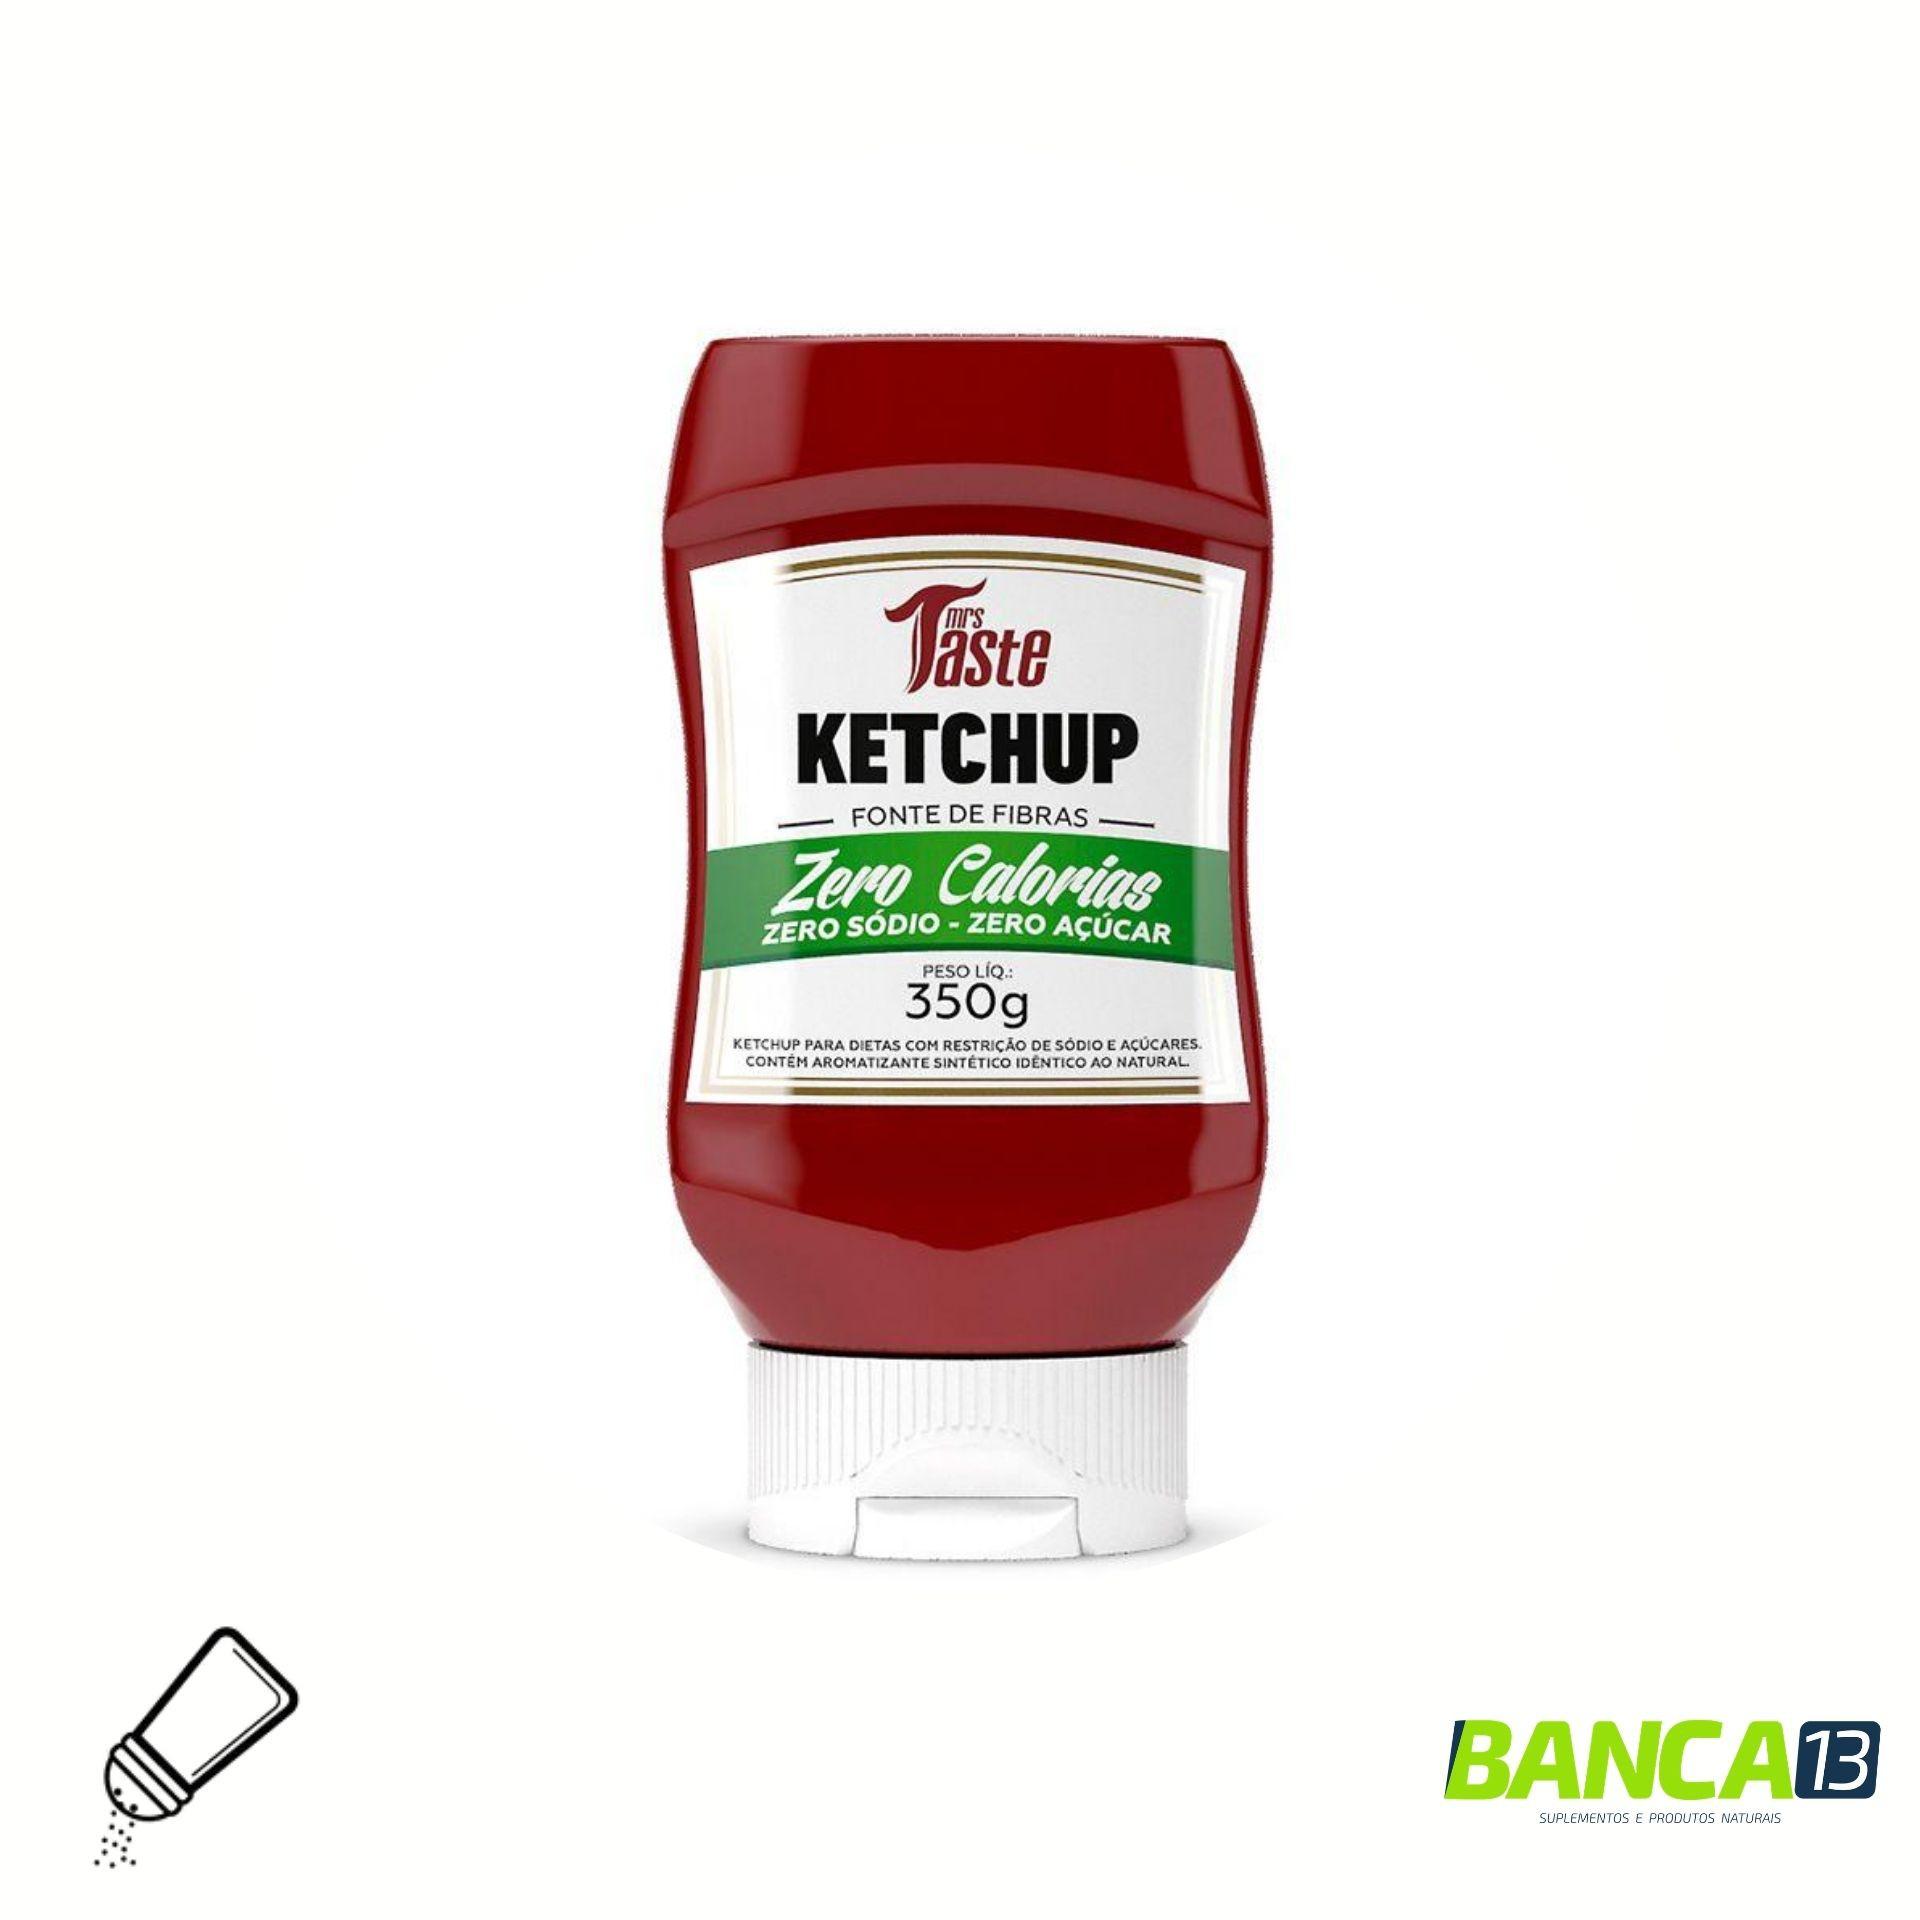 MOLHO KETCHUP (350G) - MRS TASTE